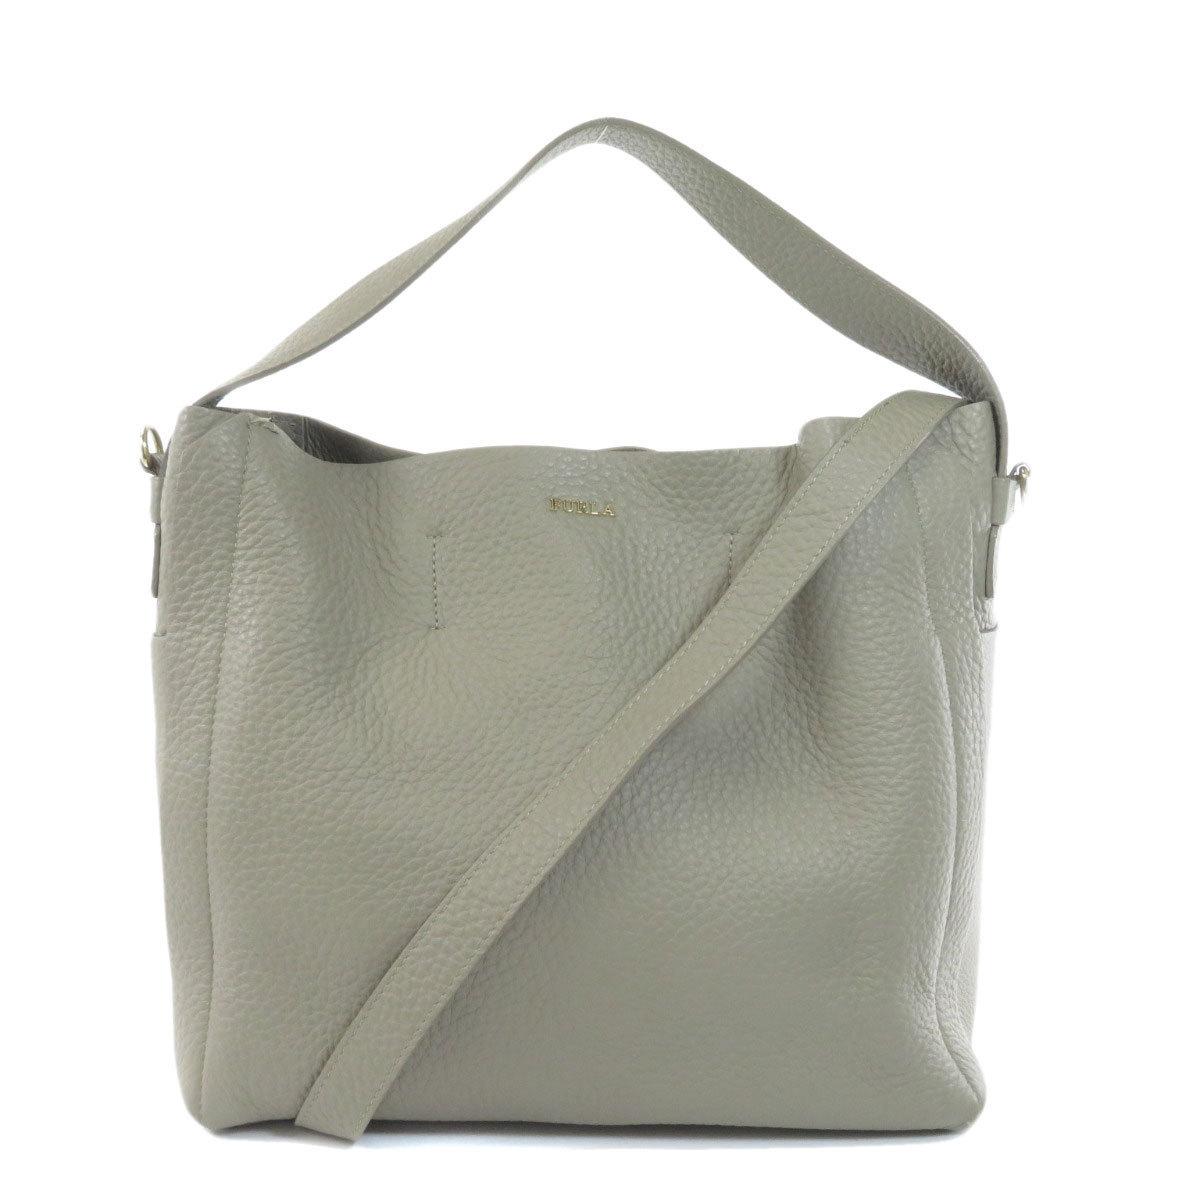 Furla 2WAY Shoulder Bag Leather Ladies